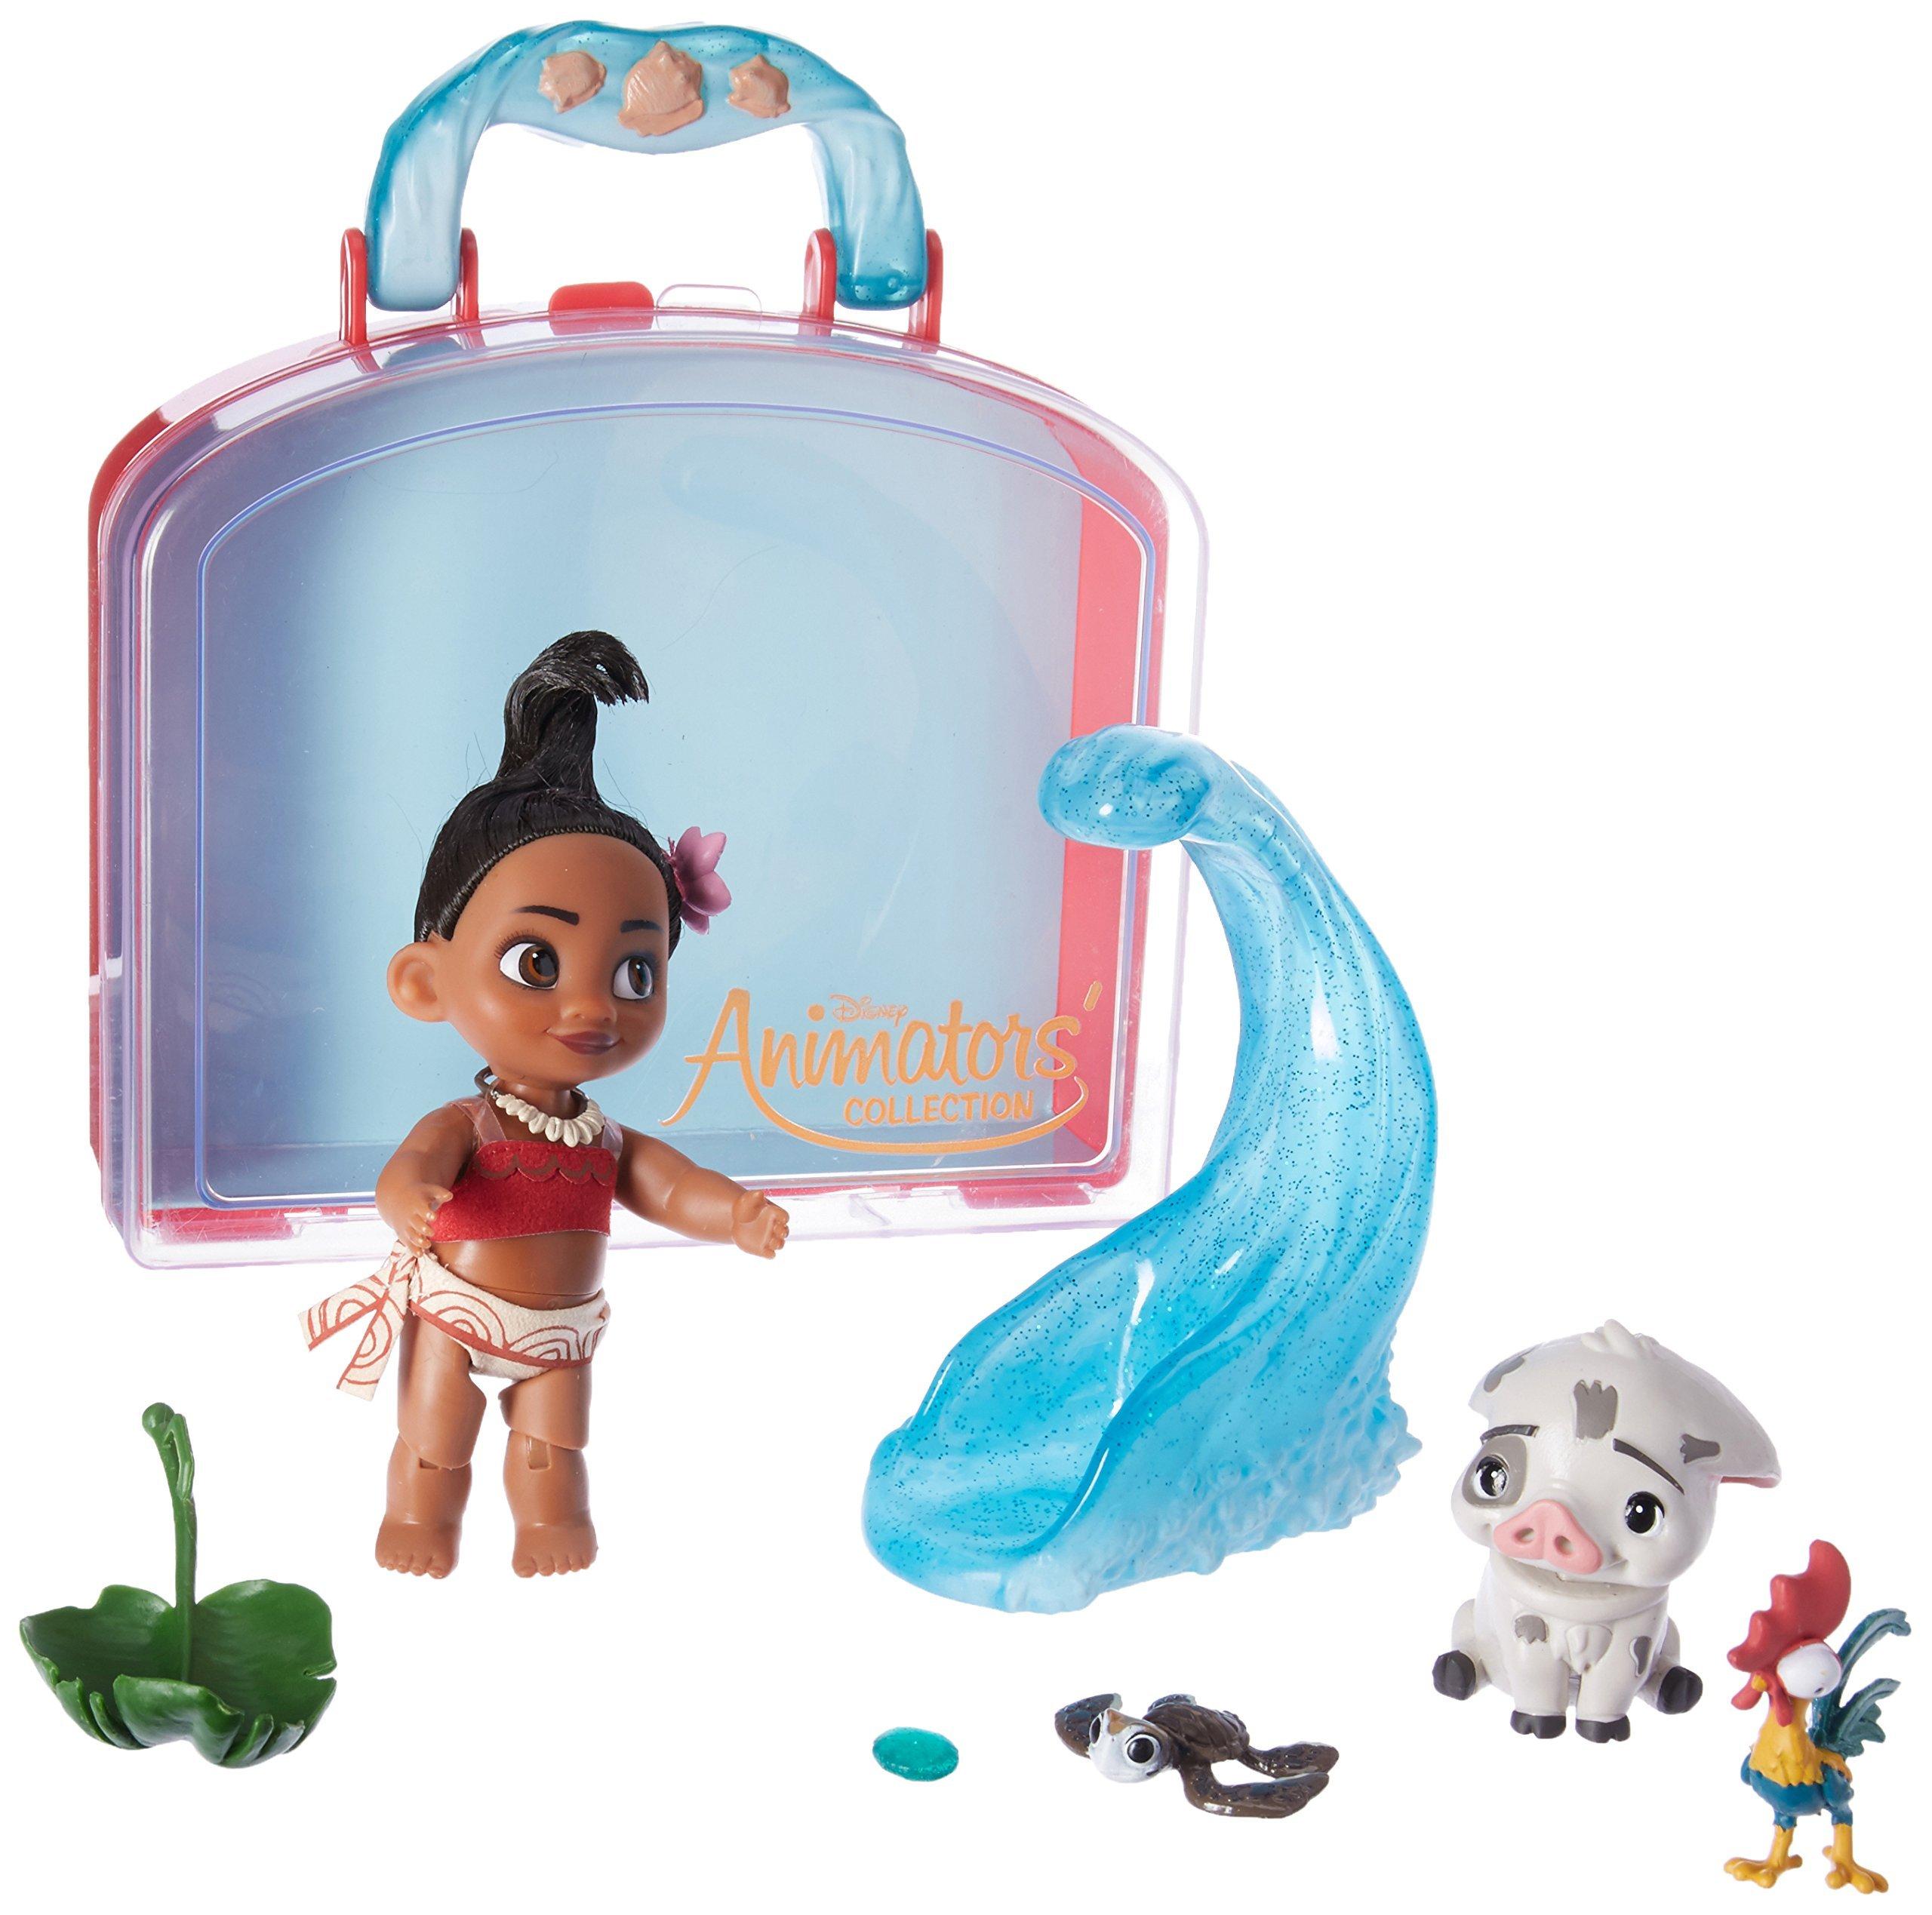 Disney Animators Collection Moana Mini Doll Play Set 5 Inch Amazon Com Au Toys Games